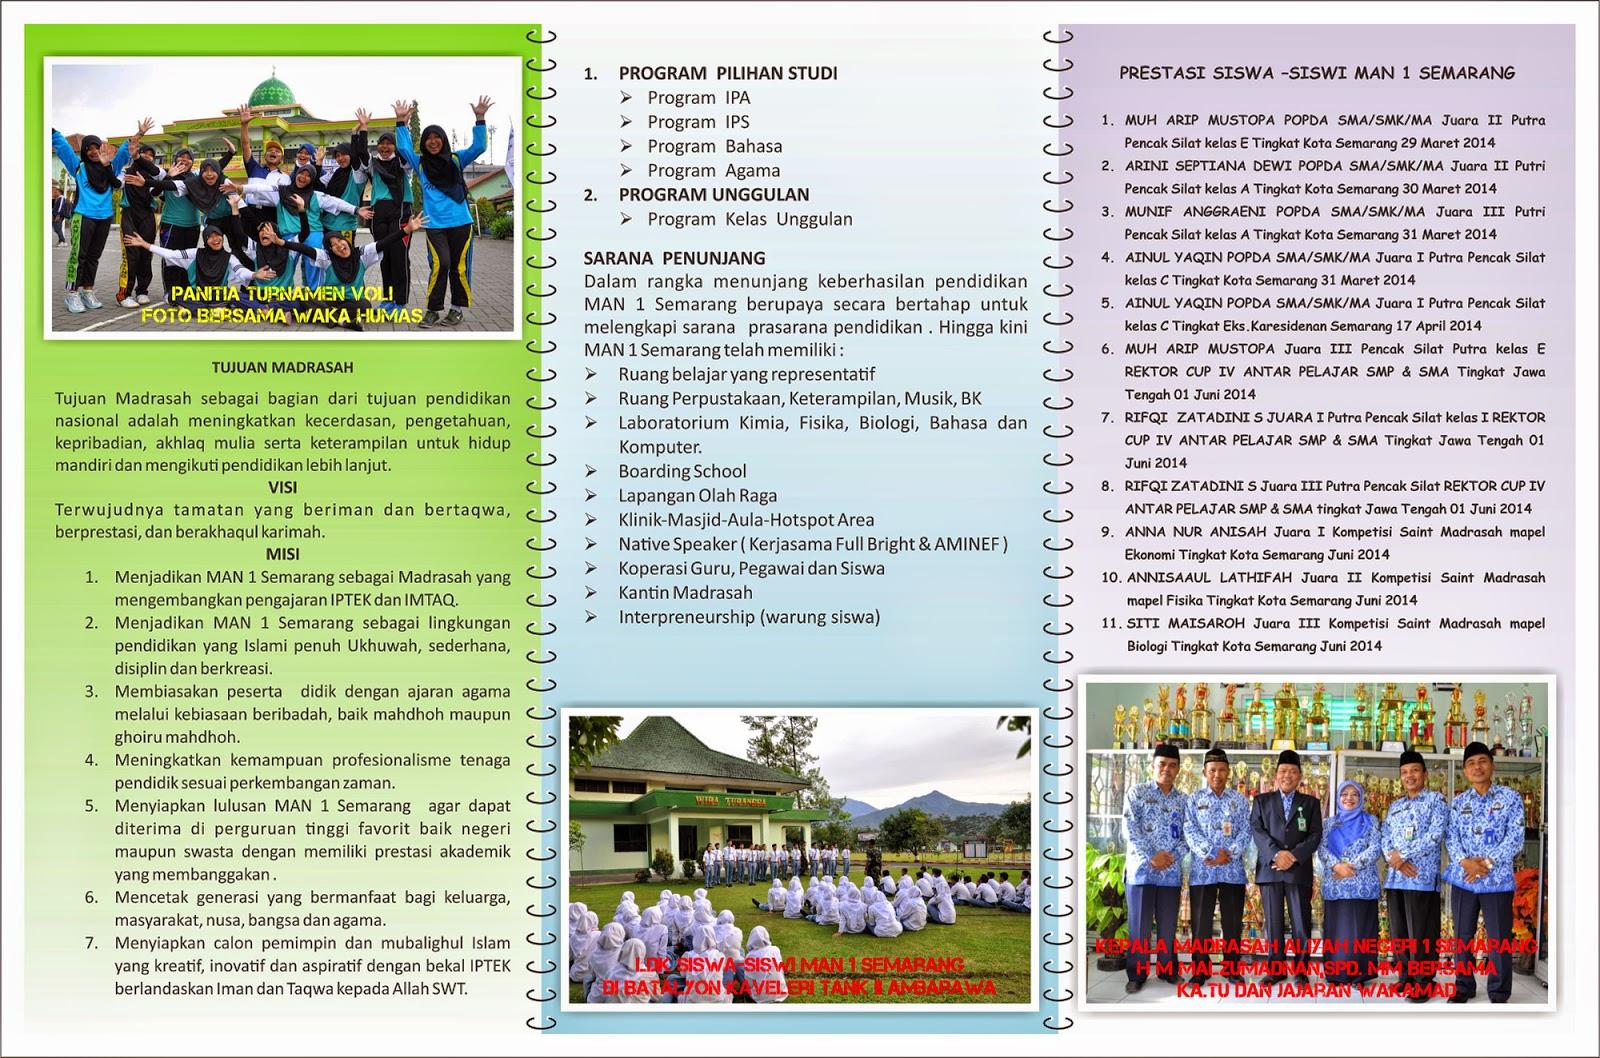 Brosur Pendaftaran MAN 1 Semarang 2015 Terbaru